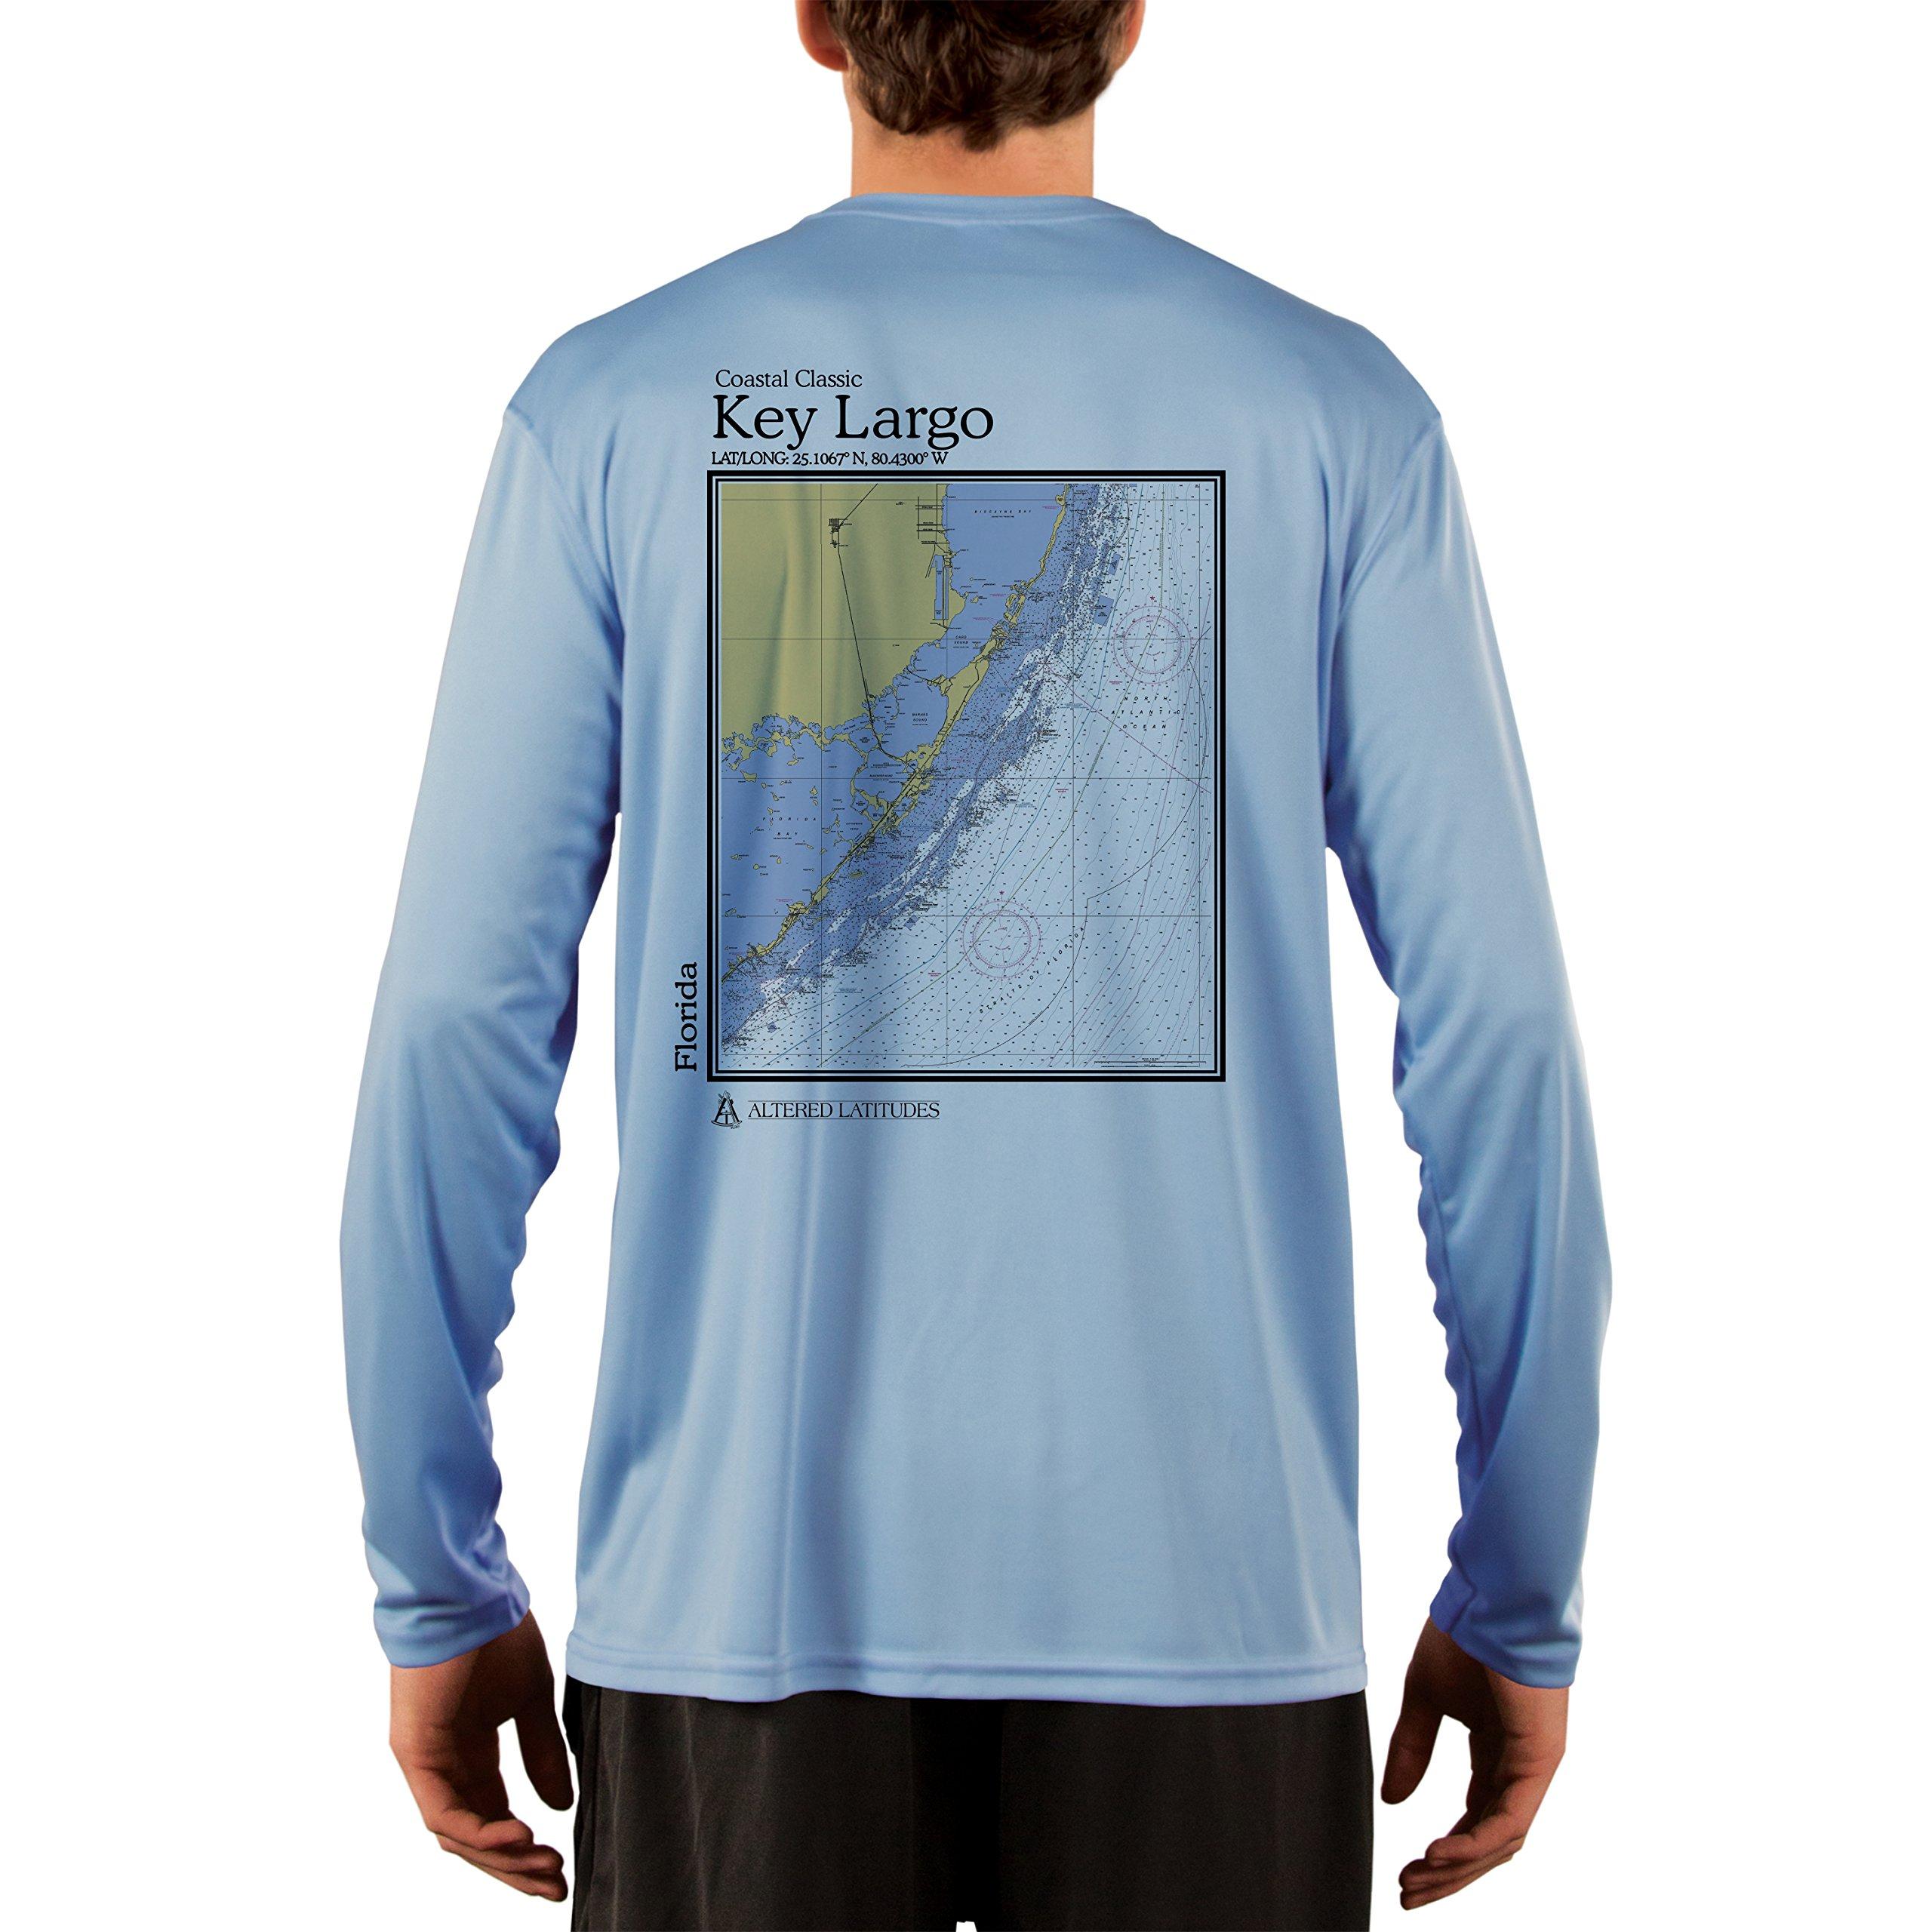 Coastal Classics Key Largo Chart Men's UPF 50+ Long Sleeve T-Shirt Medium Columbia Blue by Altered Latitudes